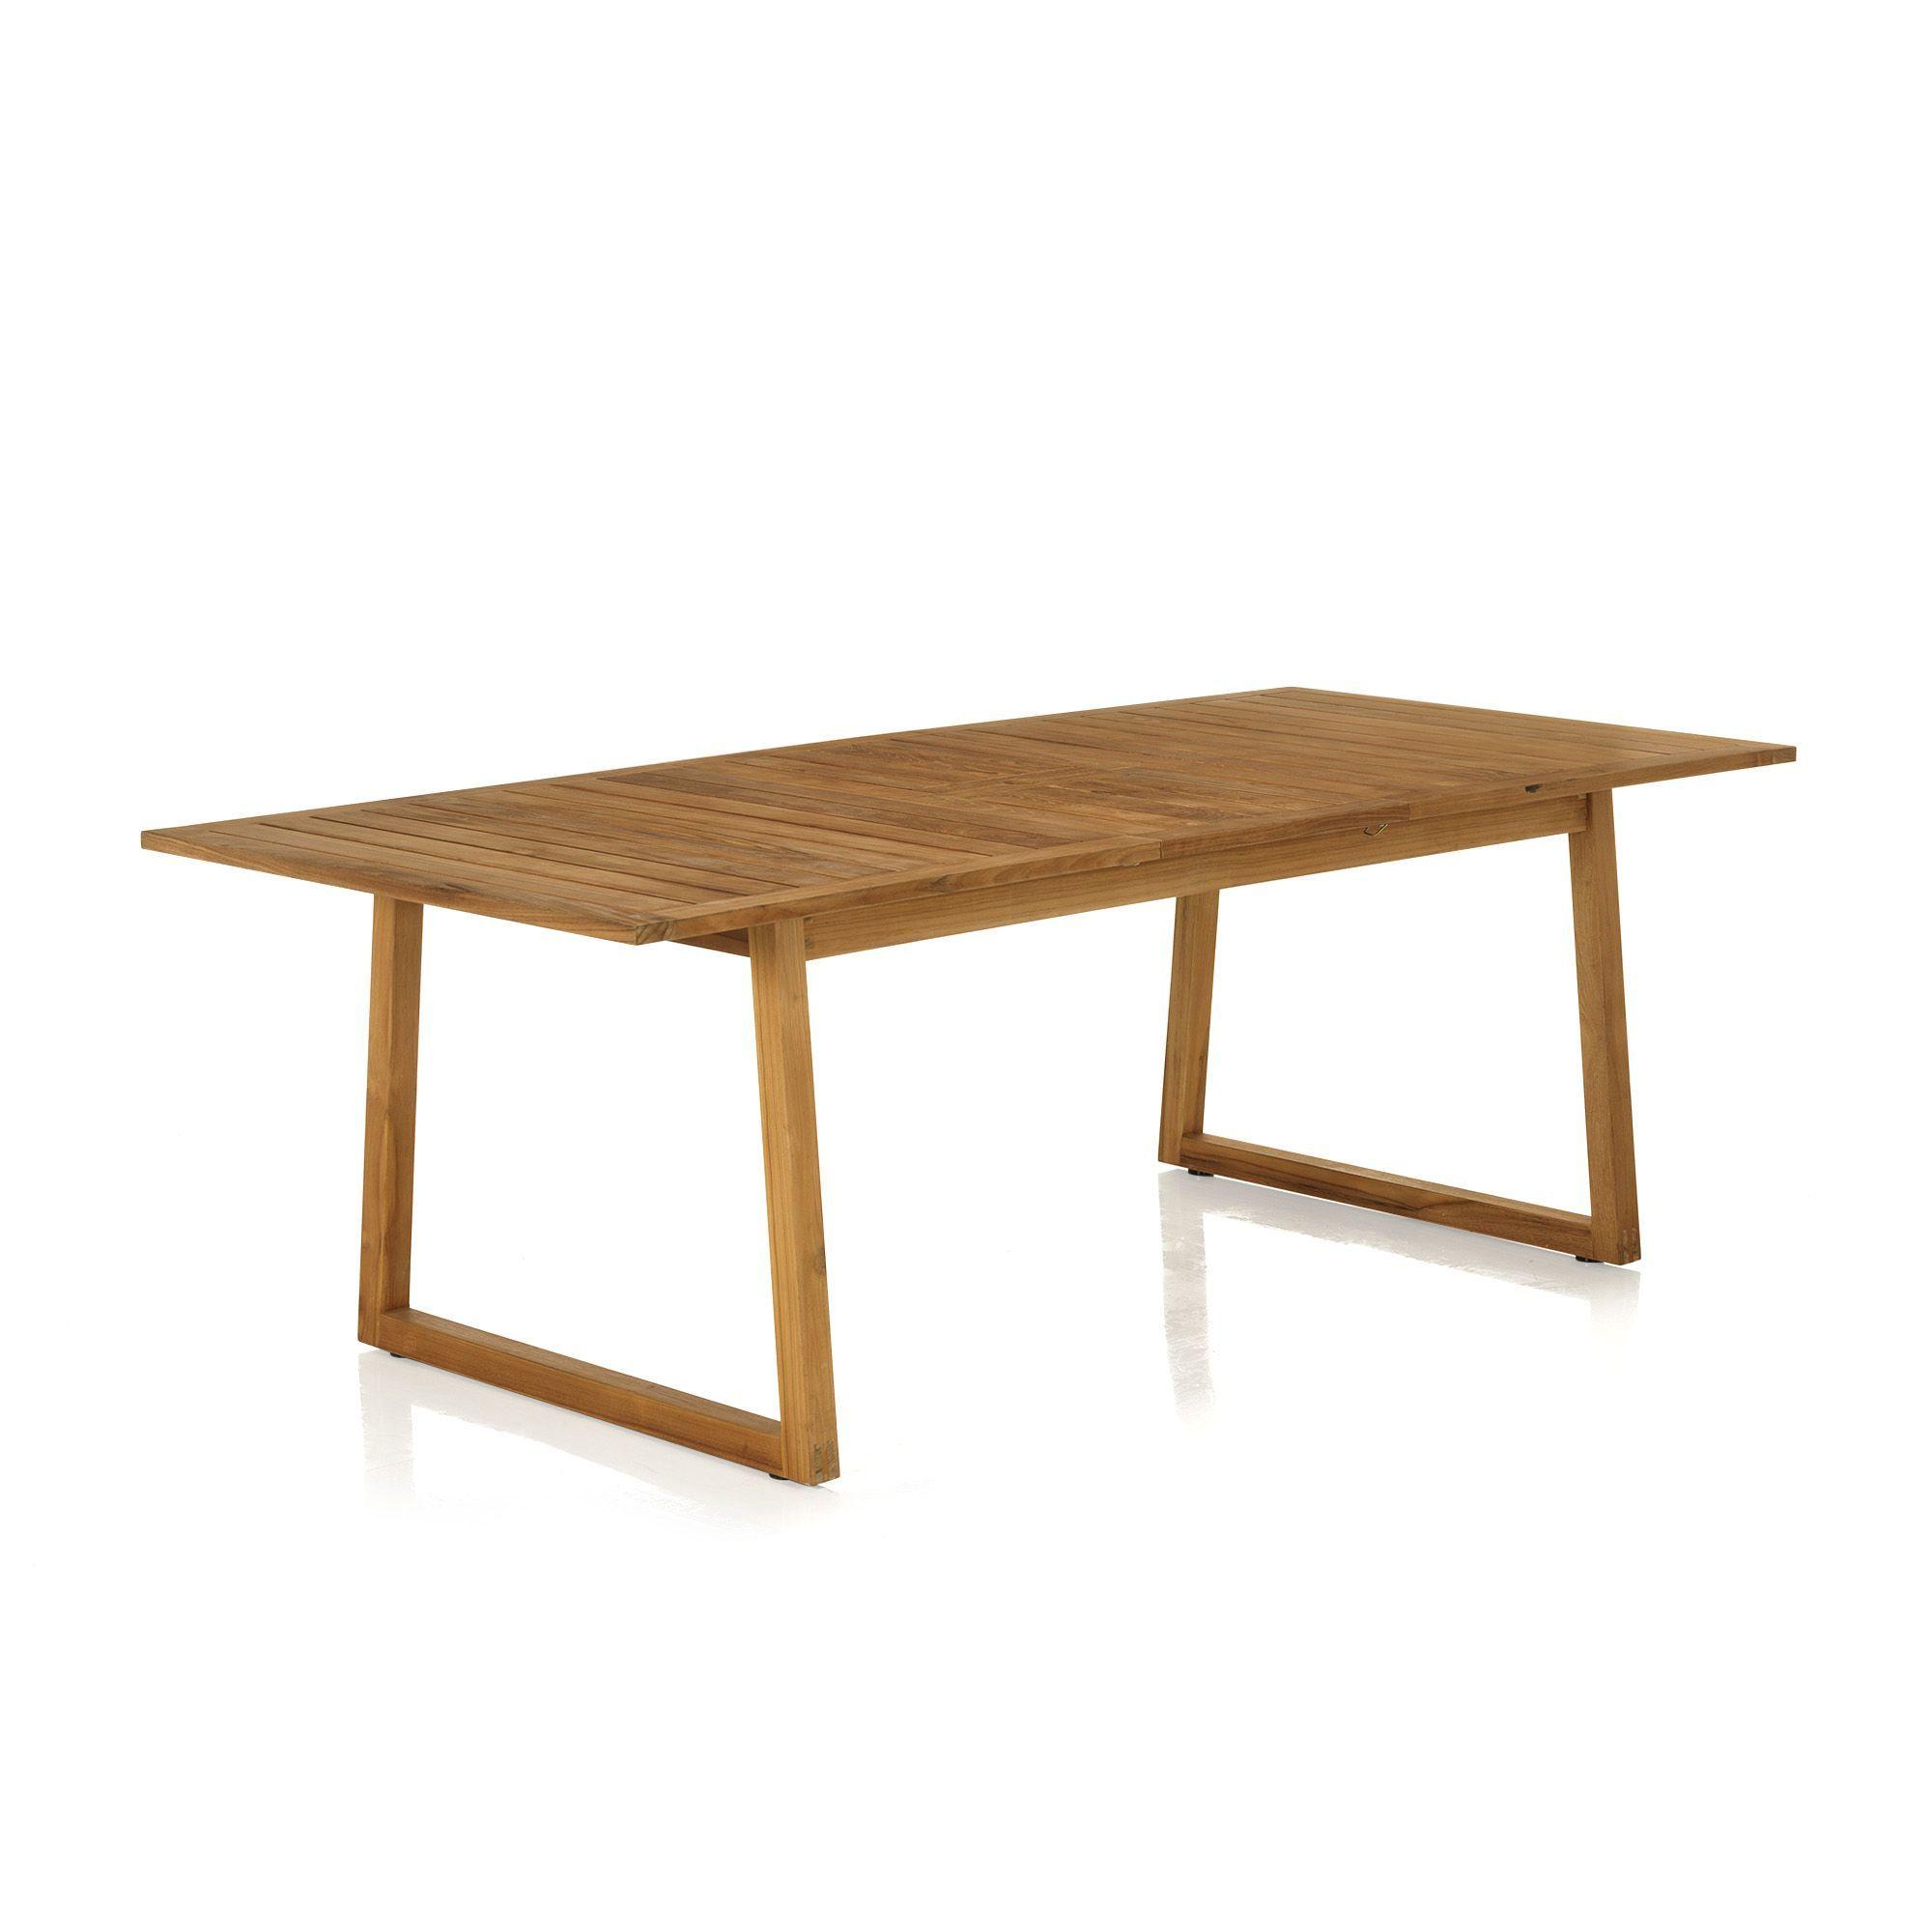 3204f54f4a82f437792a1e8f5aa8542d Incroyable De Table Basse Anglais Conception